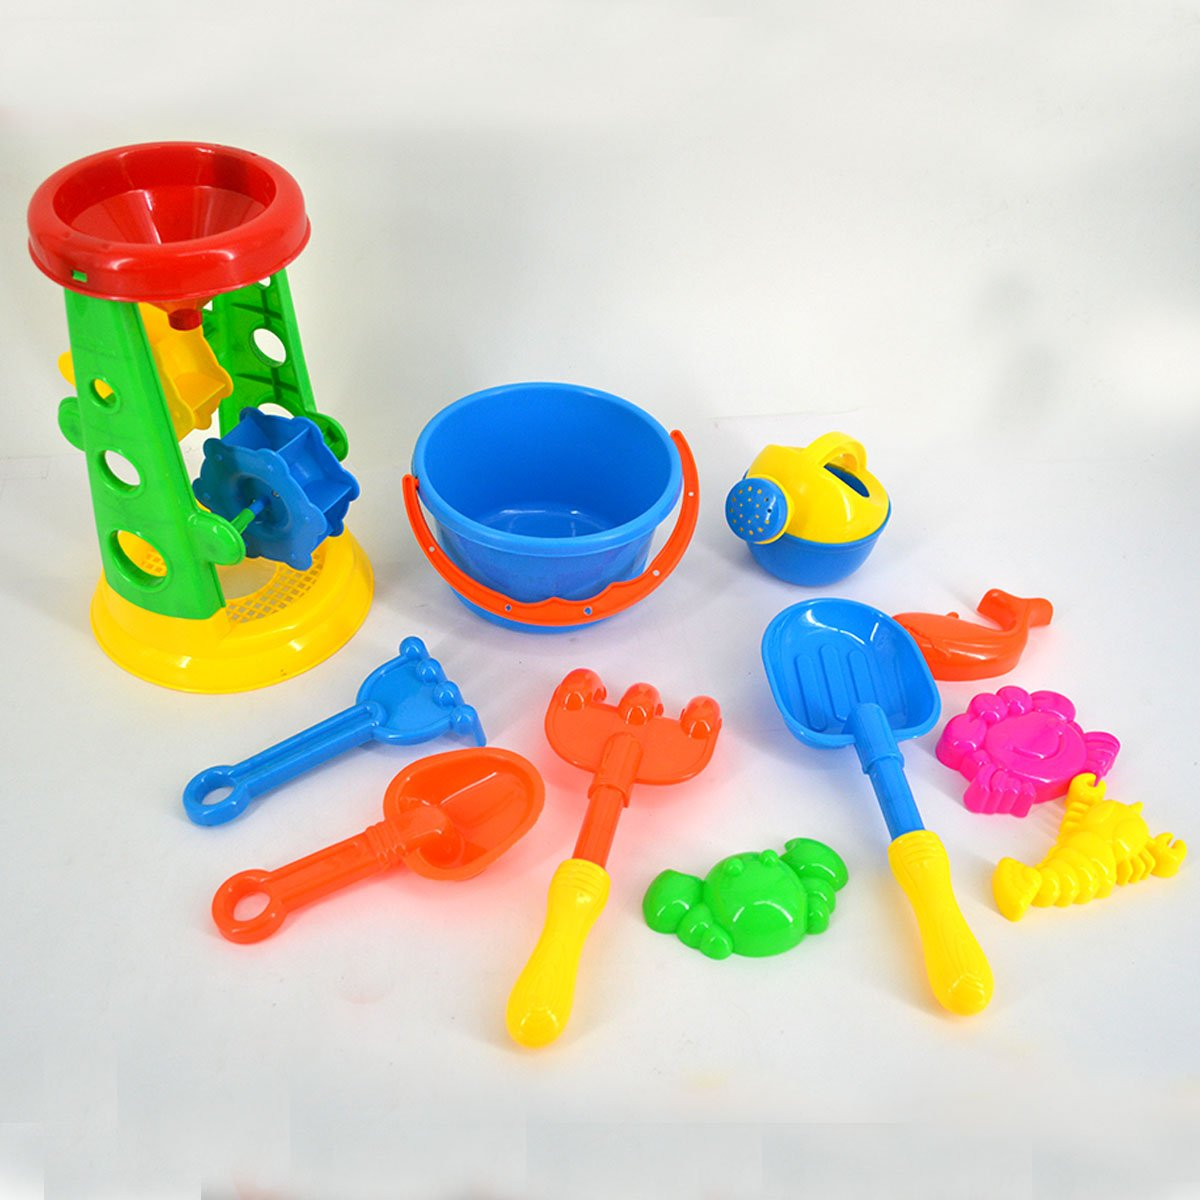 Supply 25 Pcs Sand Toys Plastic Creative Sand Dredging Castle Bucket Sandbox Beach Toys Sand Toy For Boys Girls Latest Technology Beach/sand Toys